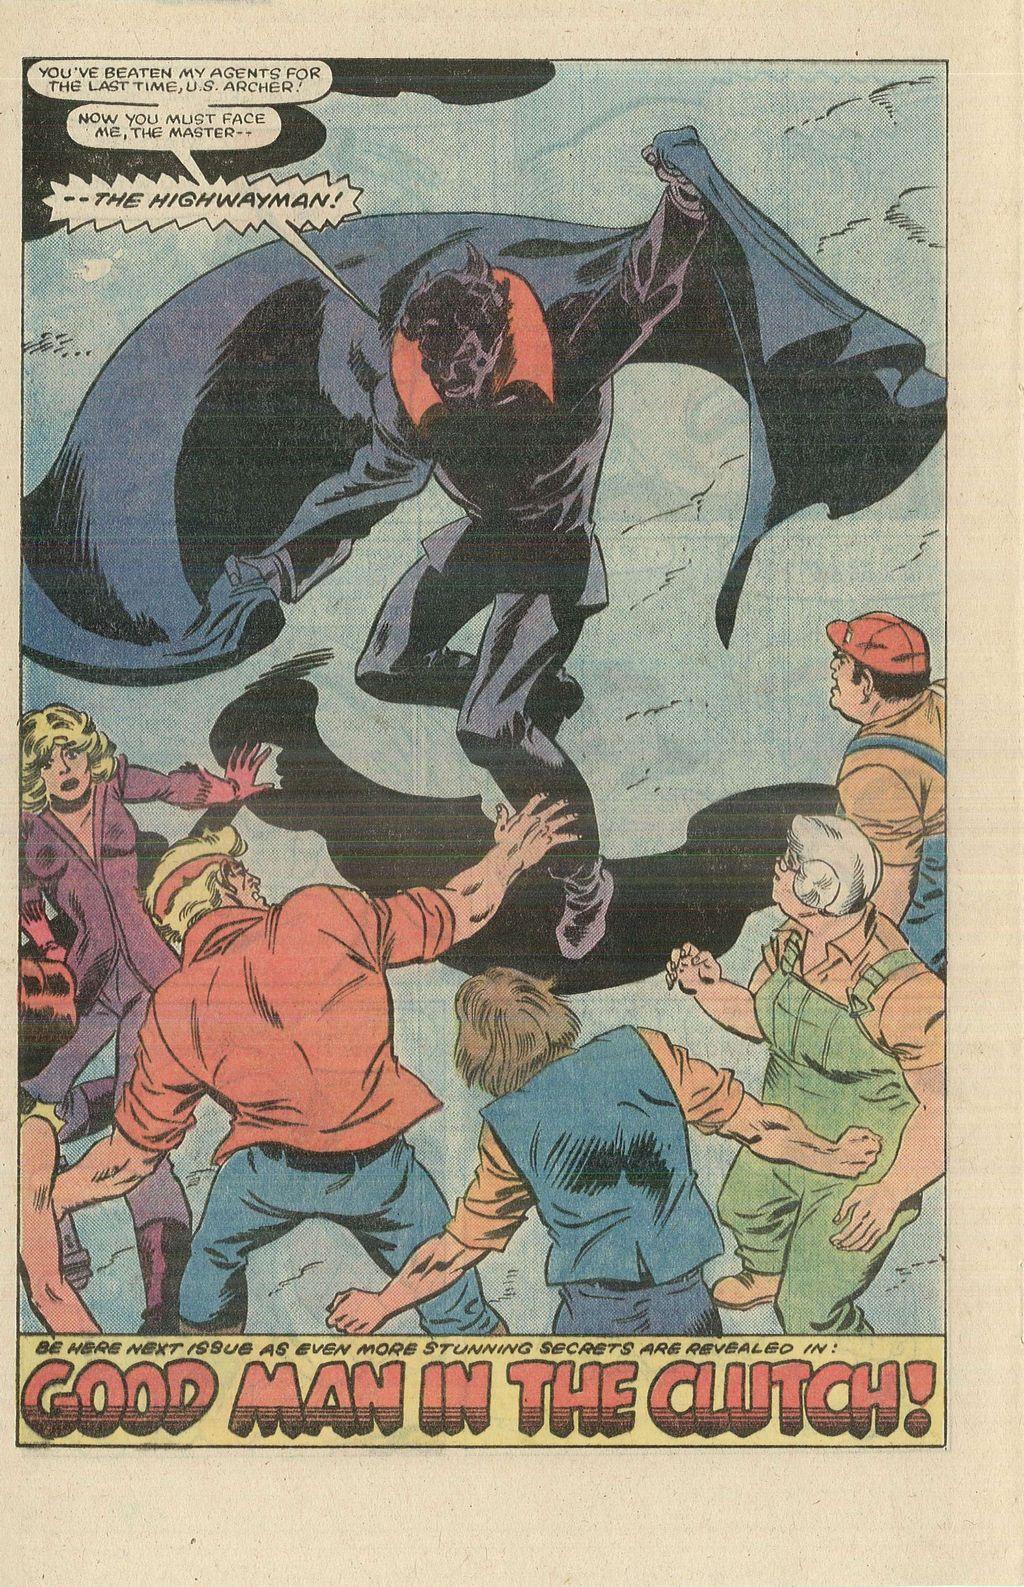 Read online U.S. 1 comic -  Issue #9 - 32